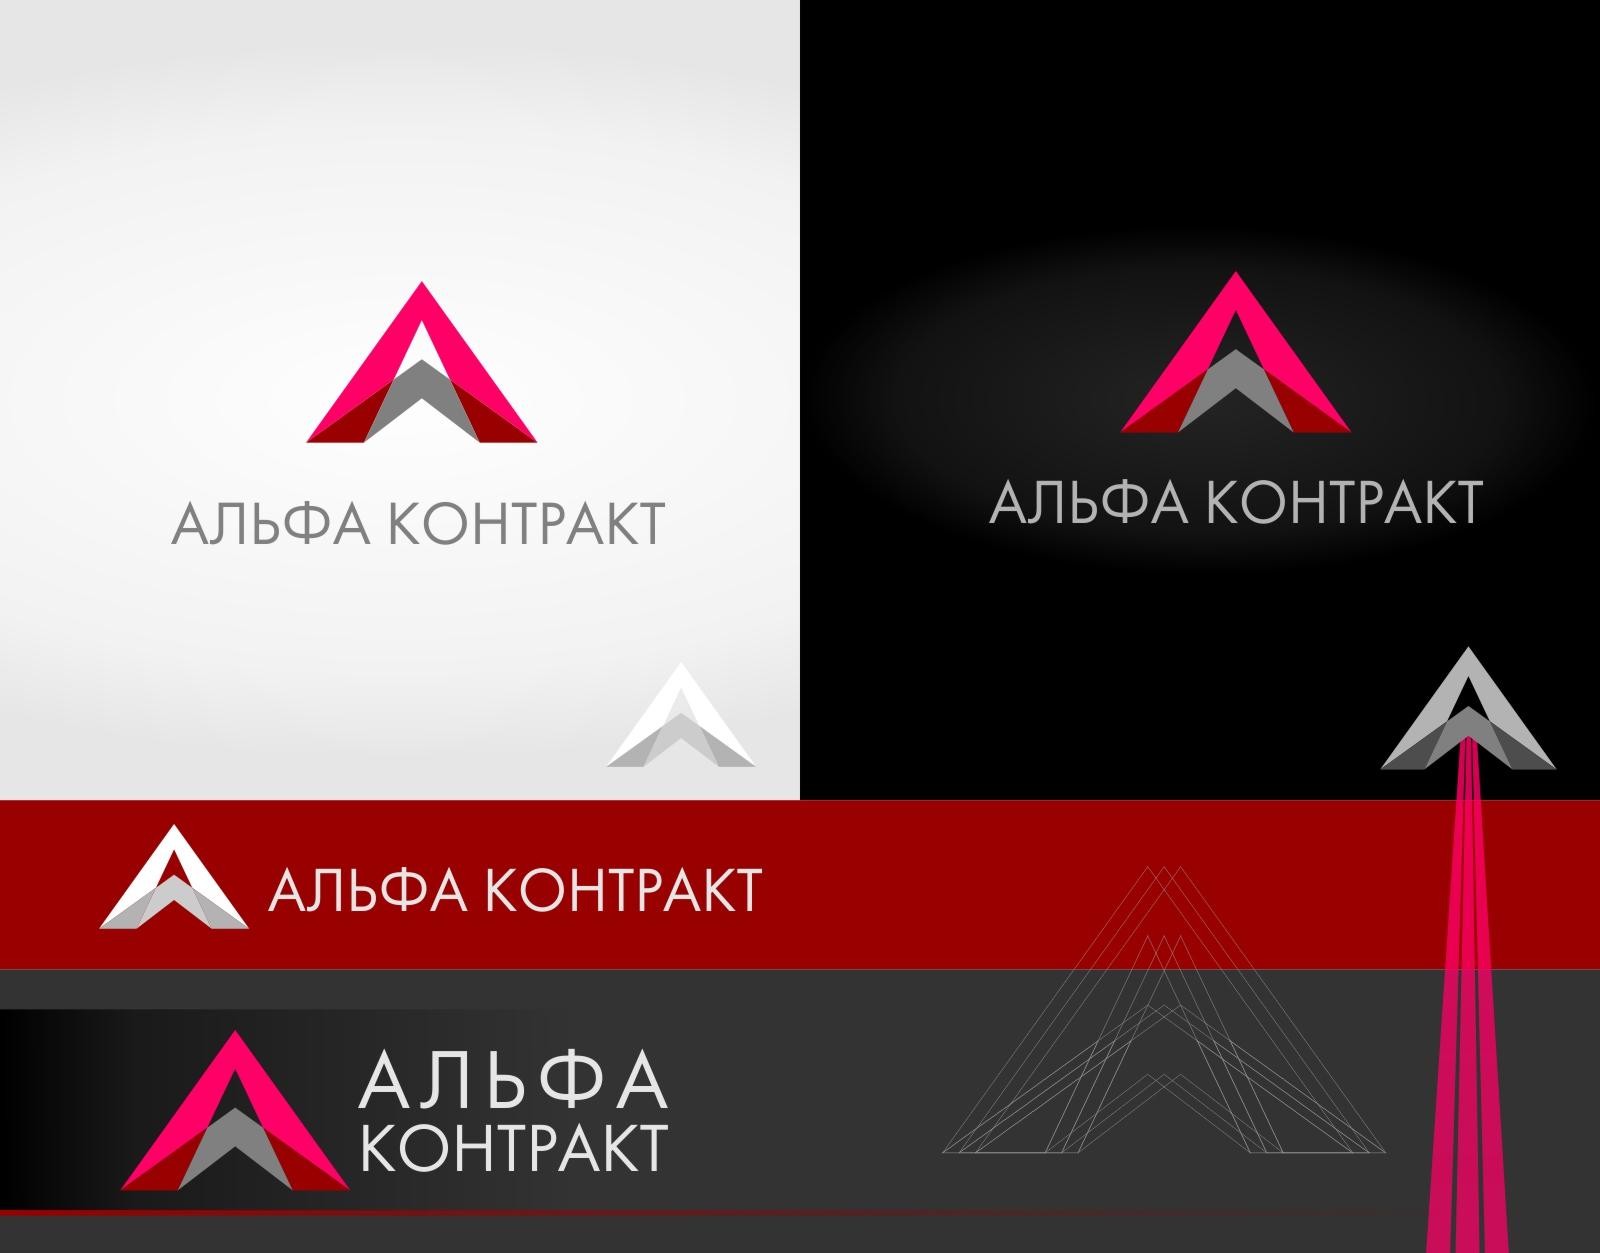 Дизайнер для разработки логотипа компании фото f_4125bf8355564c1a.jpg